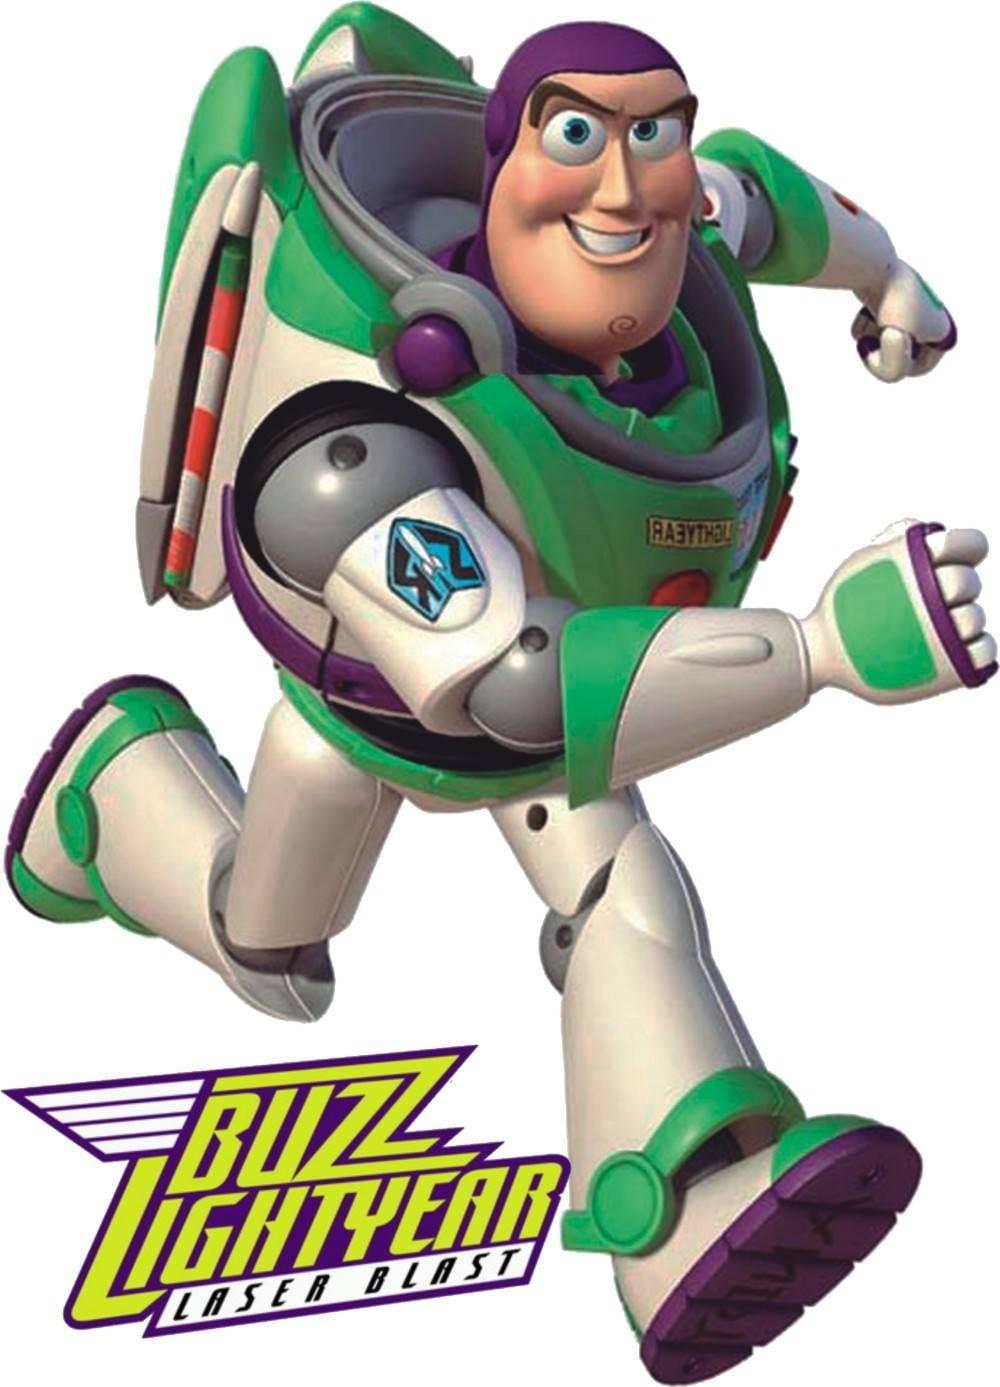 Adesivo Para Quarto Infantil Buzz Lightyear